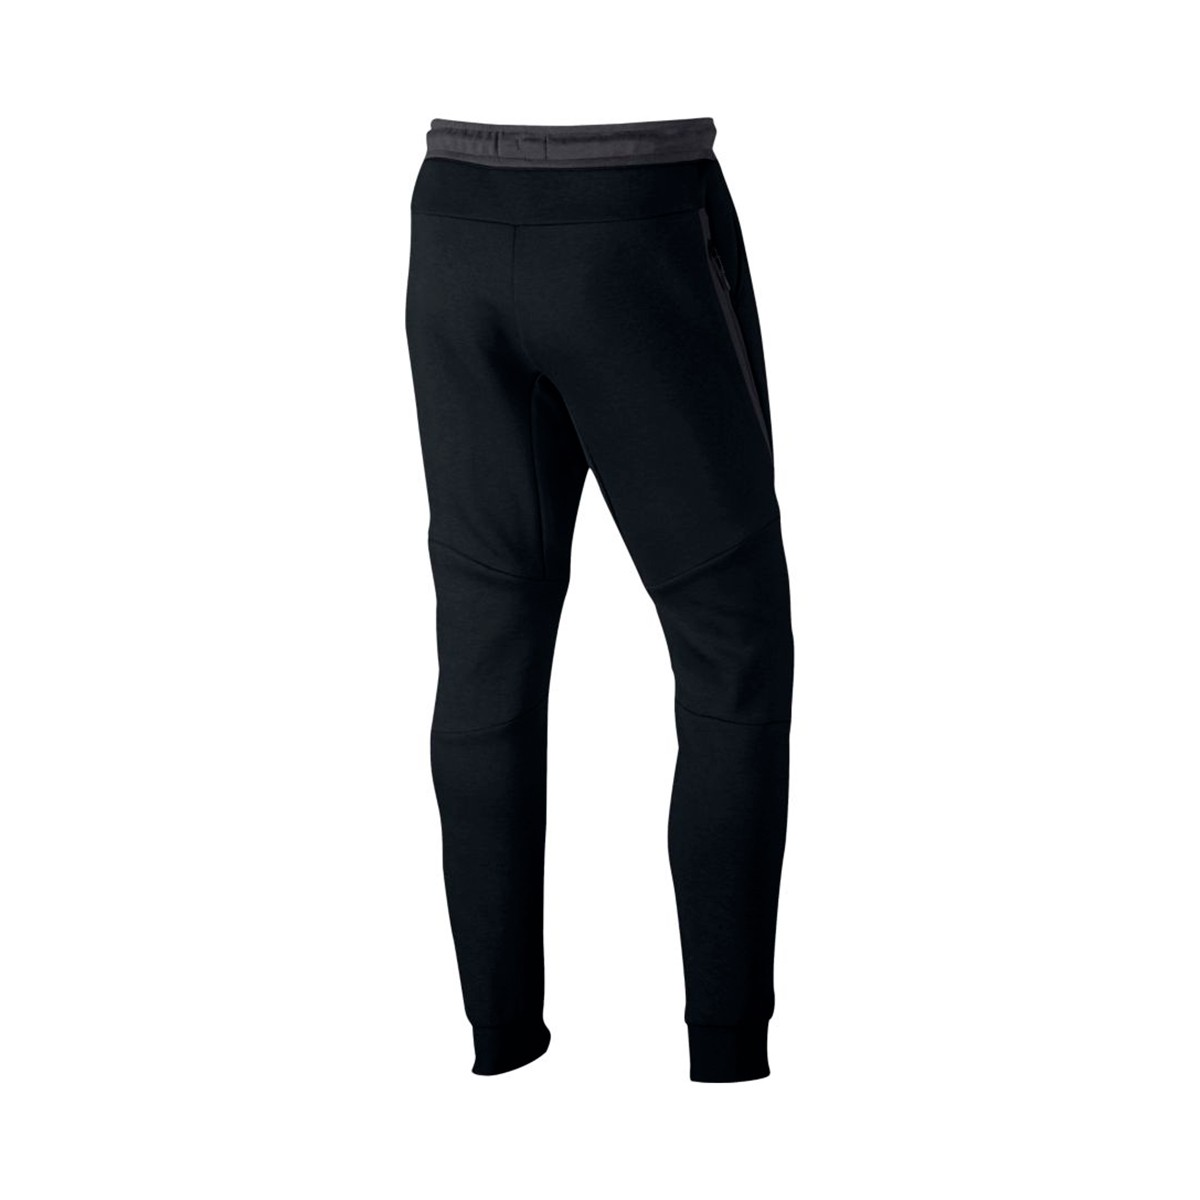 Activewear Adaptable Nike Tracksuit Bottoms medium